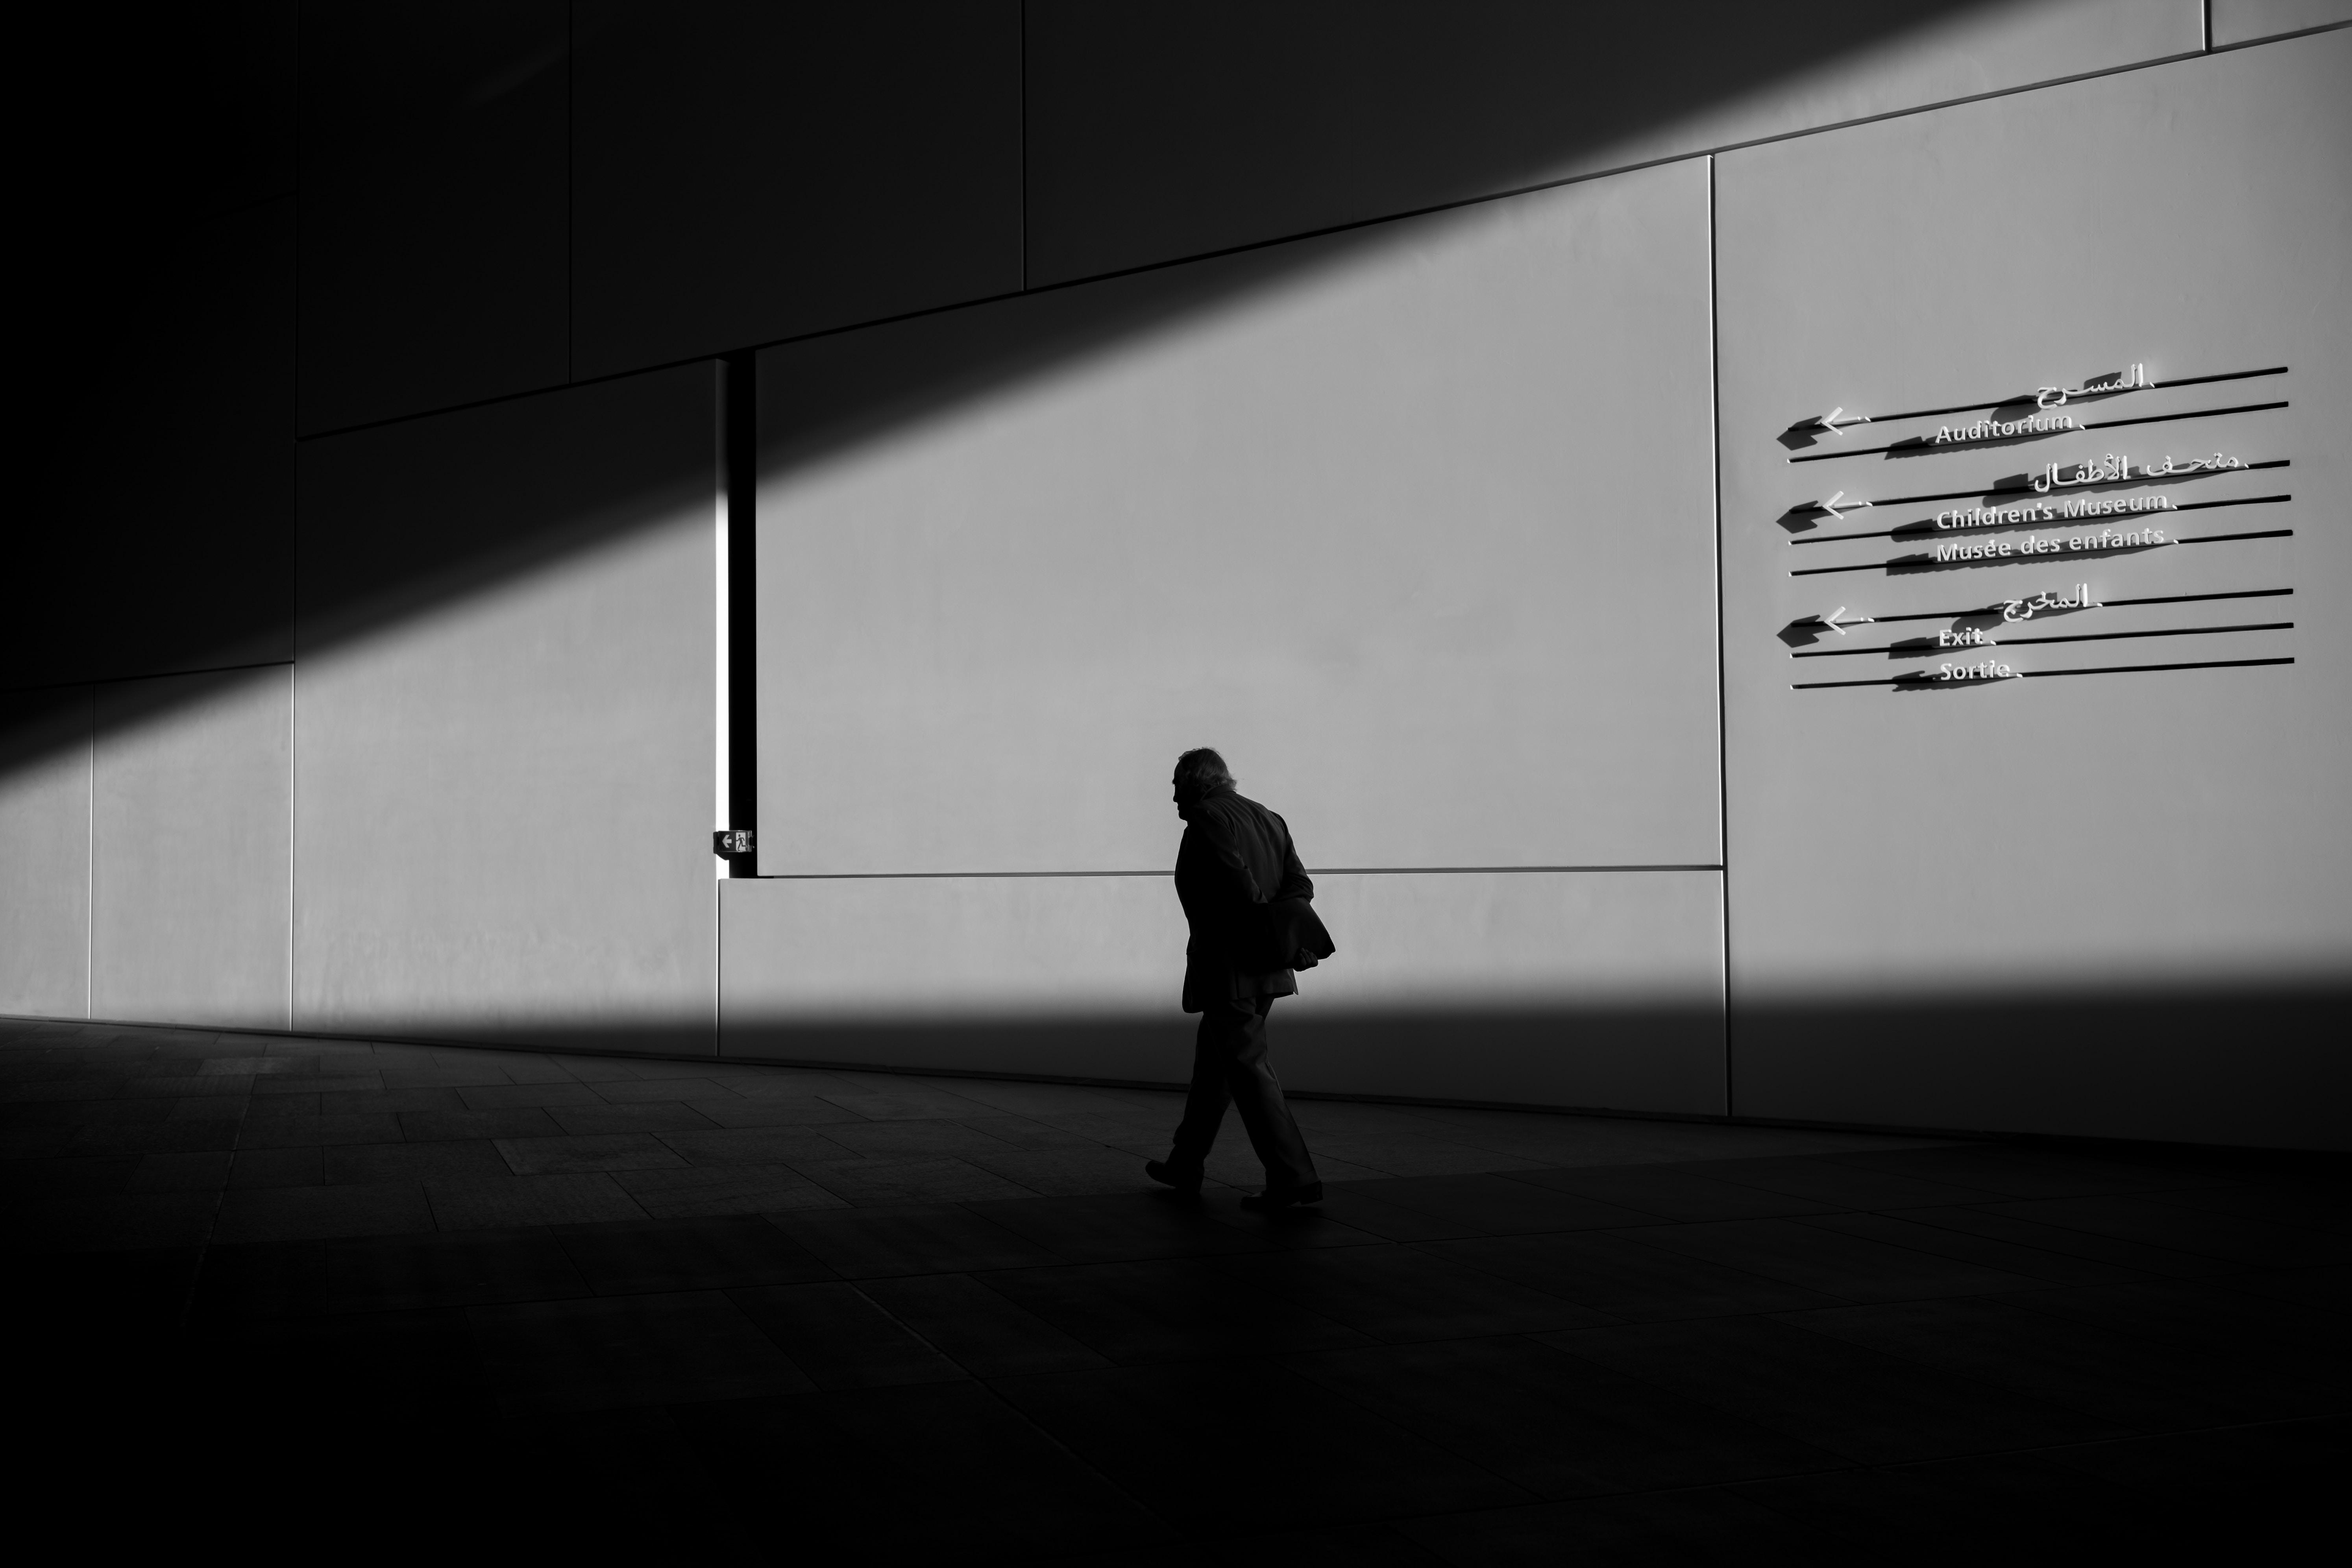 silhouette of man walking on pathway